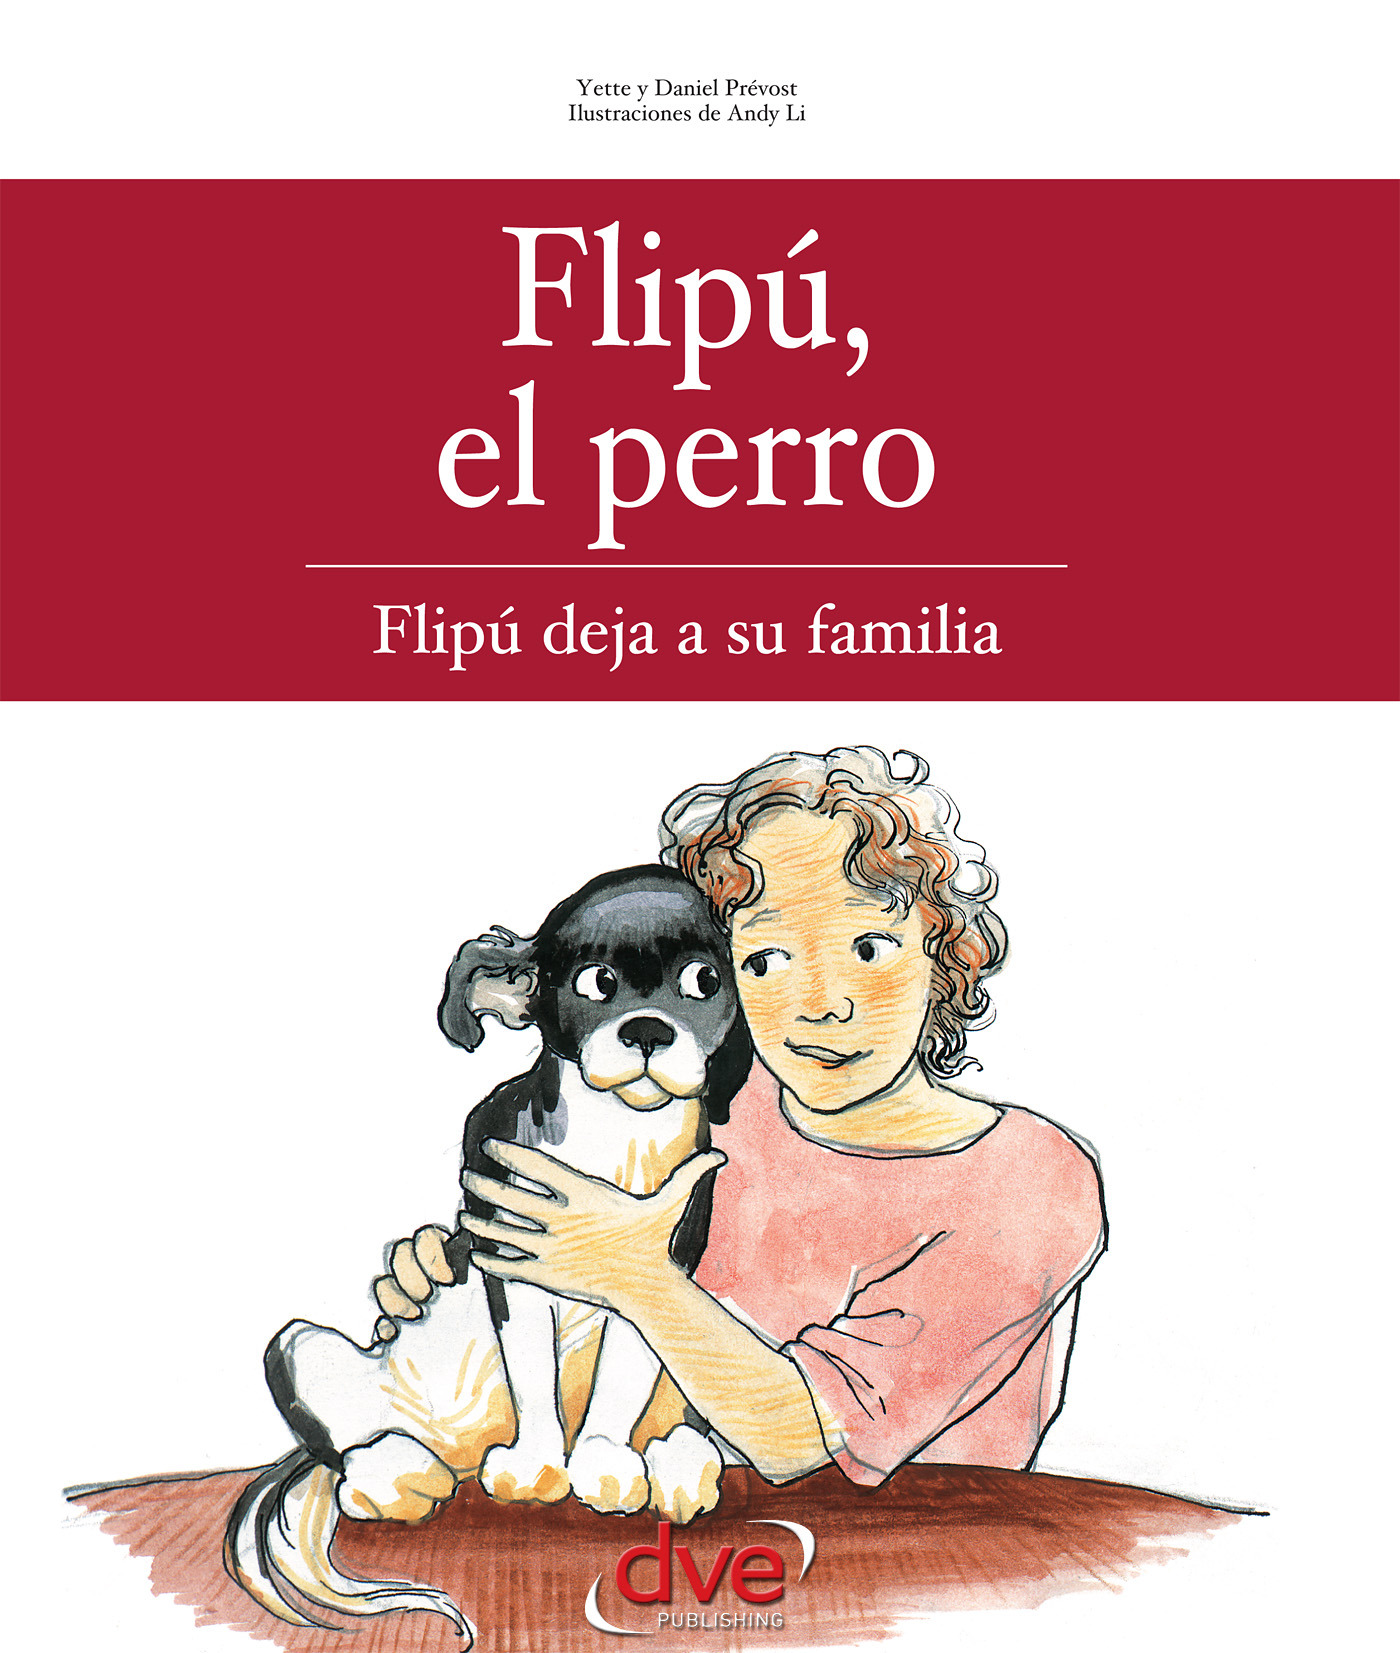 Prévost, Daniel - Flipú, el perro. Flipú deja su familia, ebook